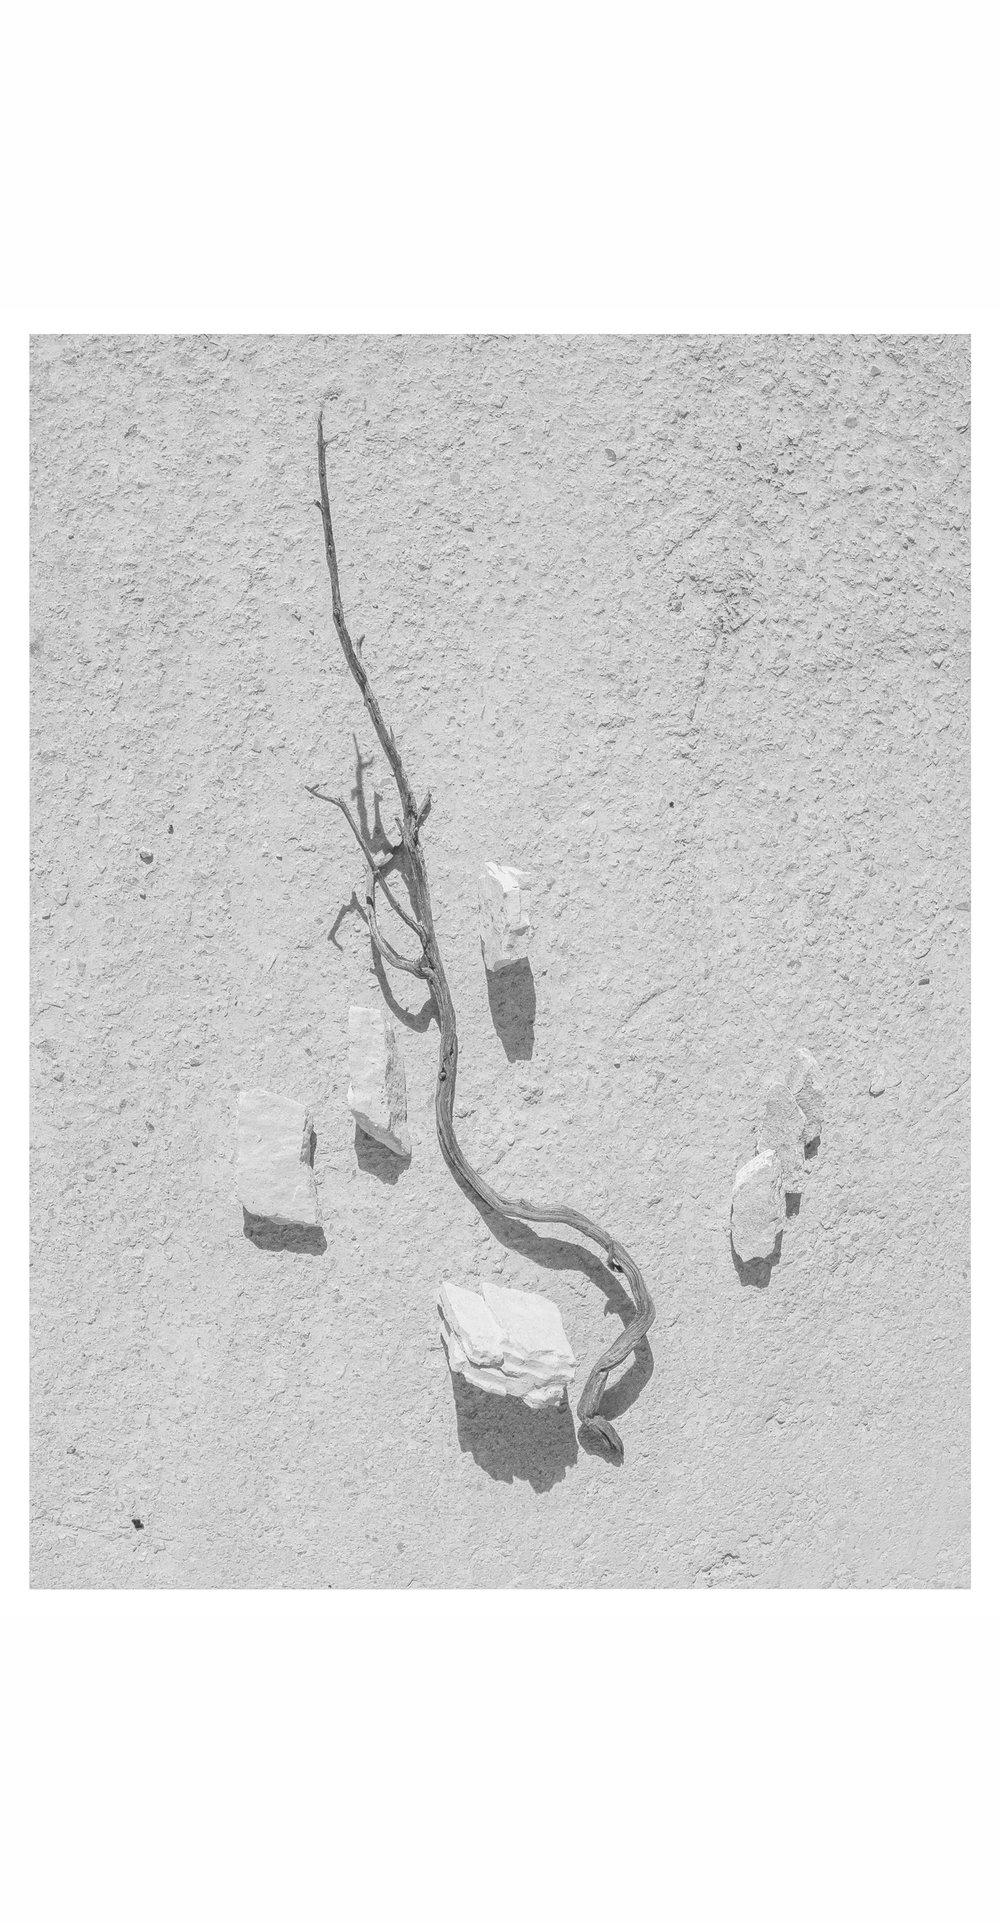 erosion3.jpg